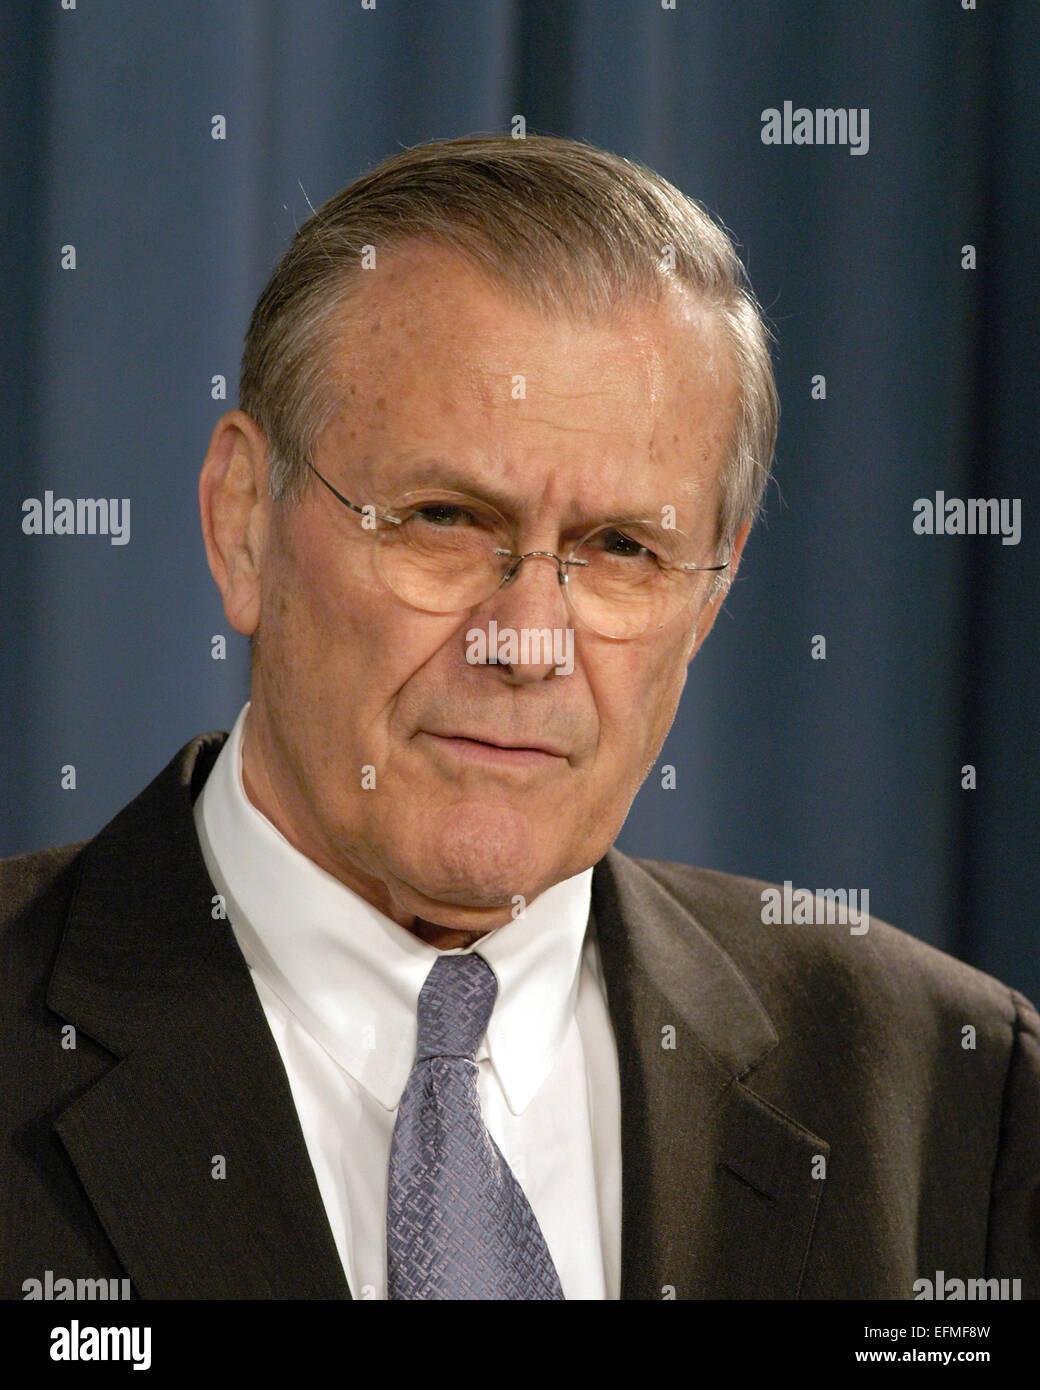 US Secretary of Defense Donald Rumsfeld during a press briefing at the Pentagon February 3, 2005 in Arlington, VA. - Stock Image